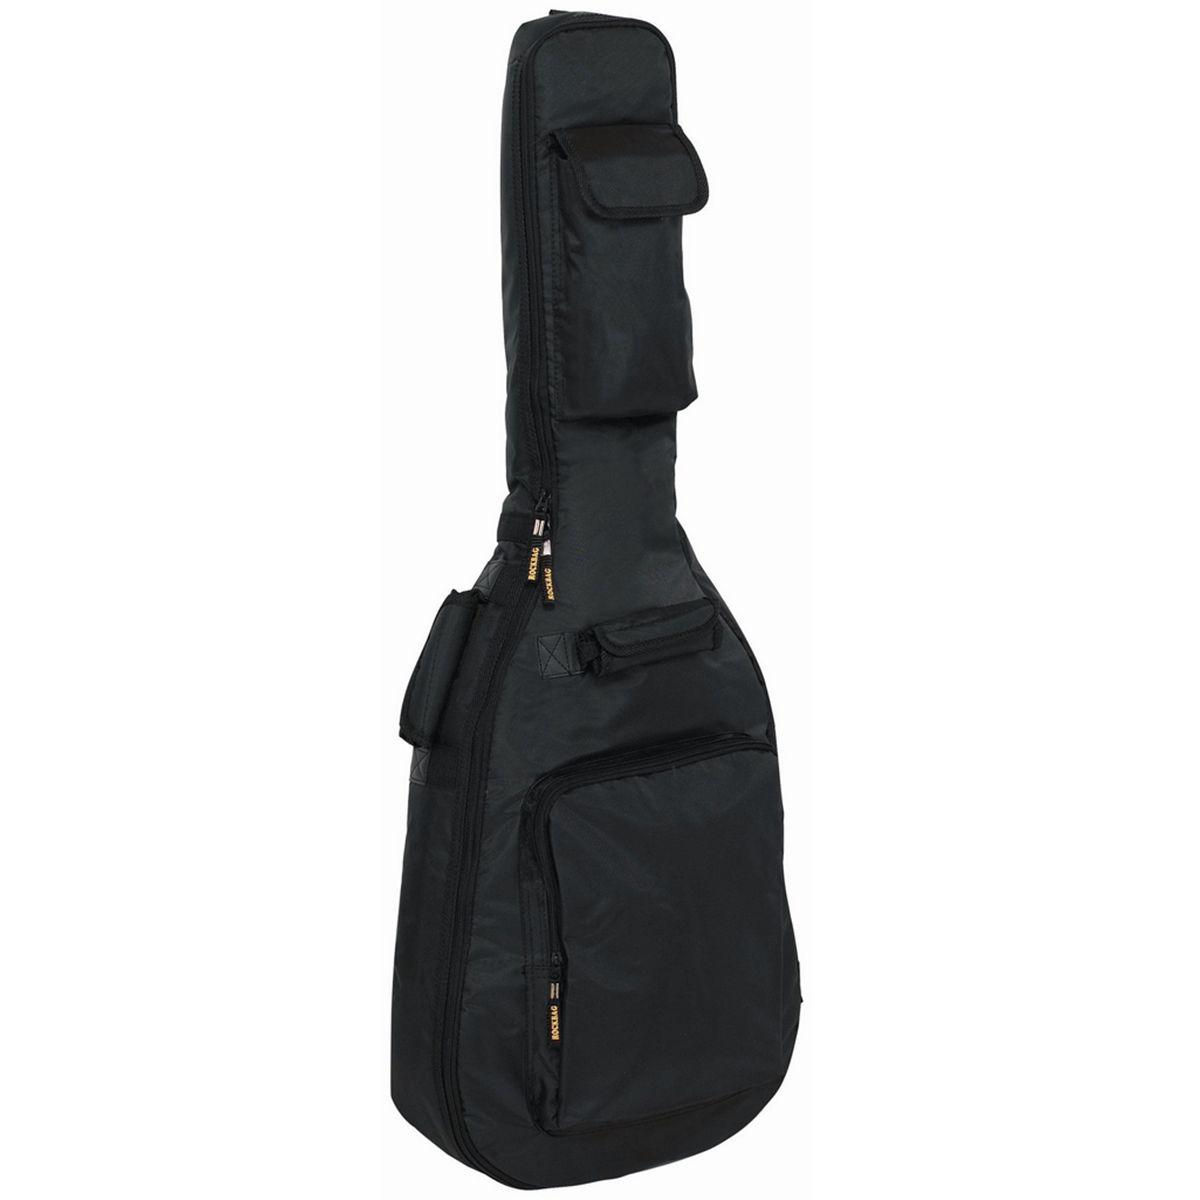 Capa Rockbag RB 20516 B Student Line para Guitarra